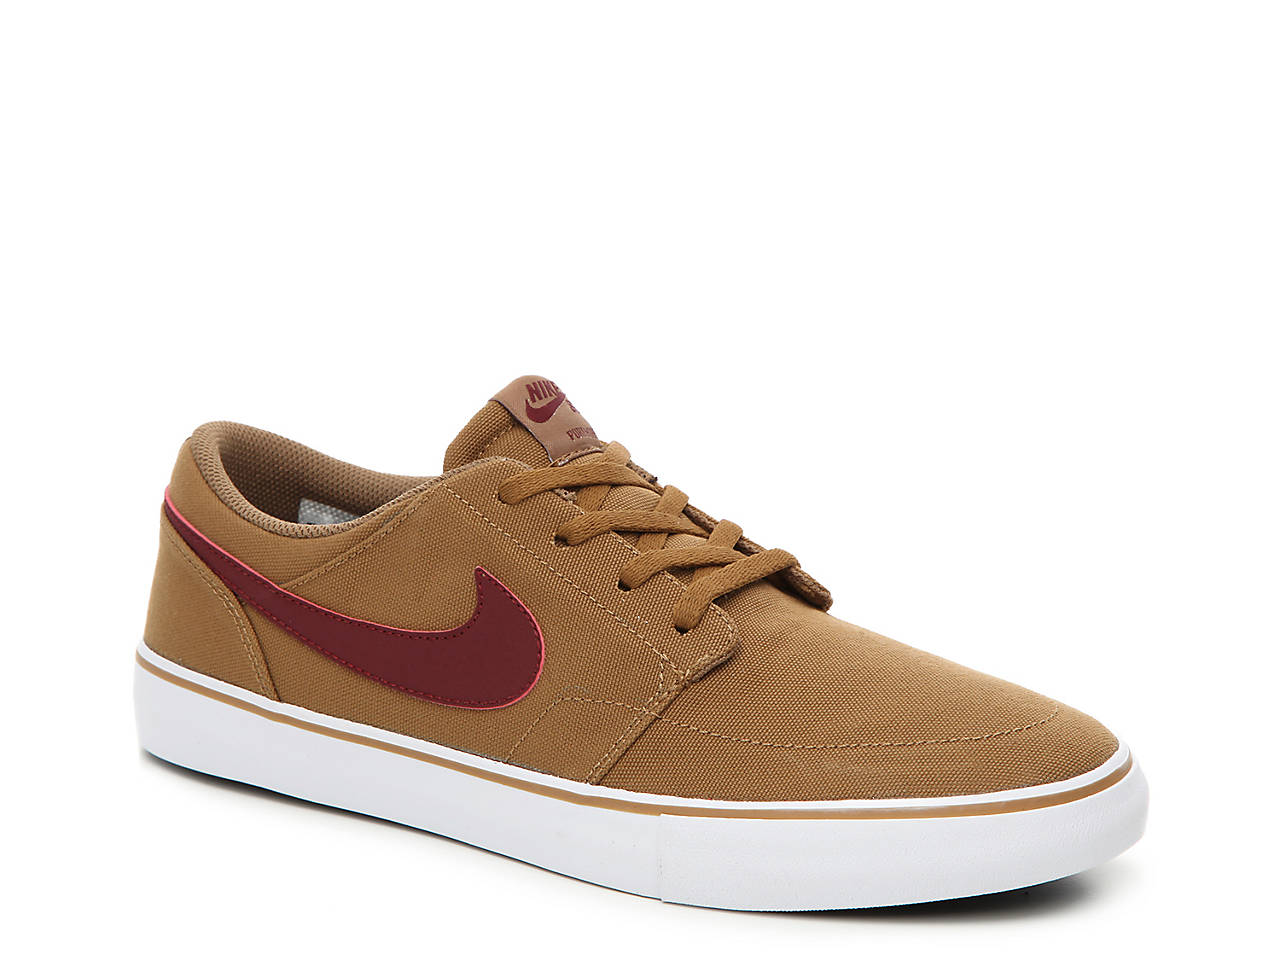 Nike zapatilla Sb Portmore Ii zapatilla Nike Hombres Hombres Zapatos Dsw c1d1aa